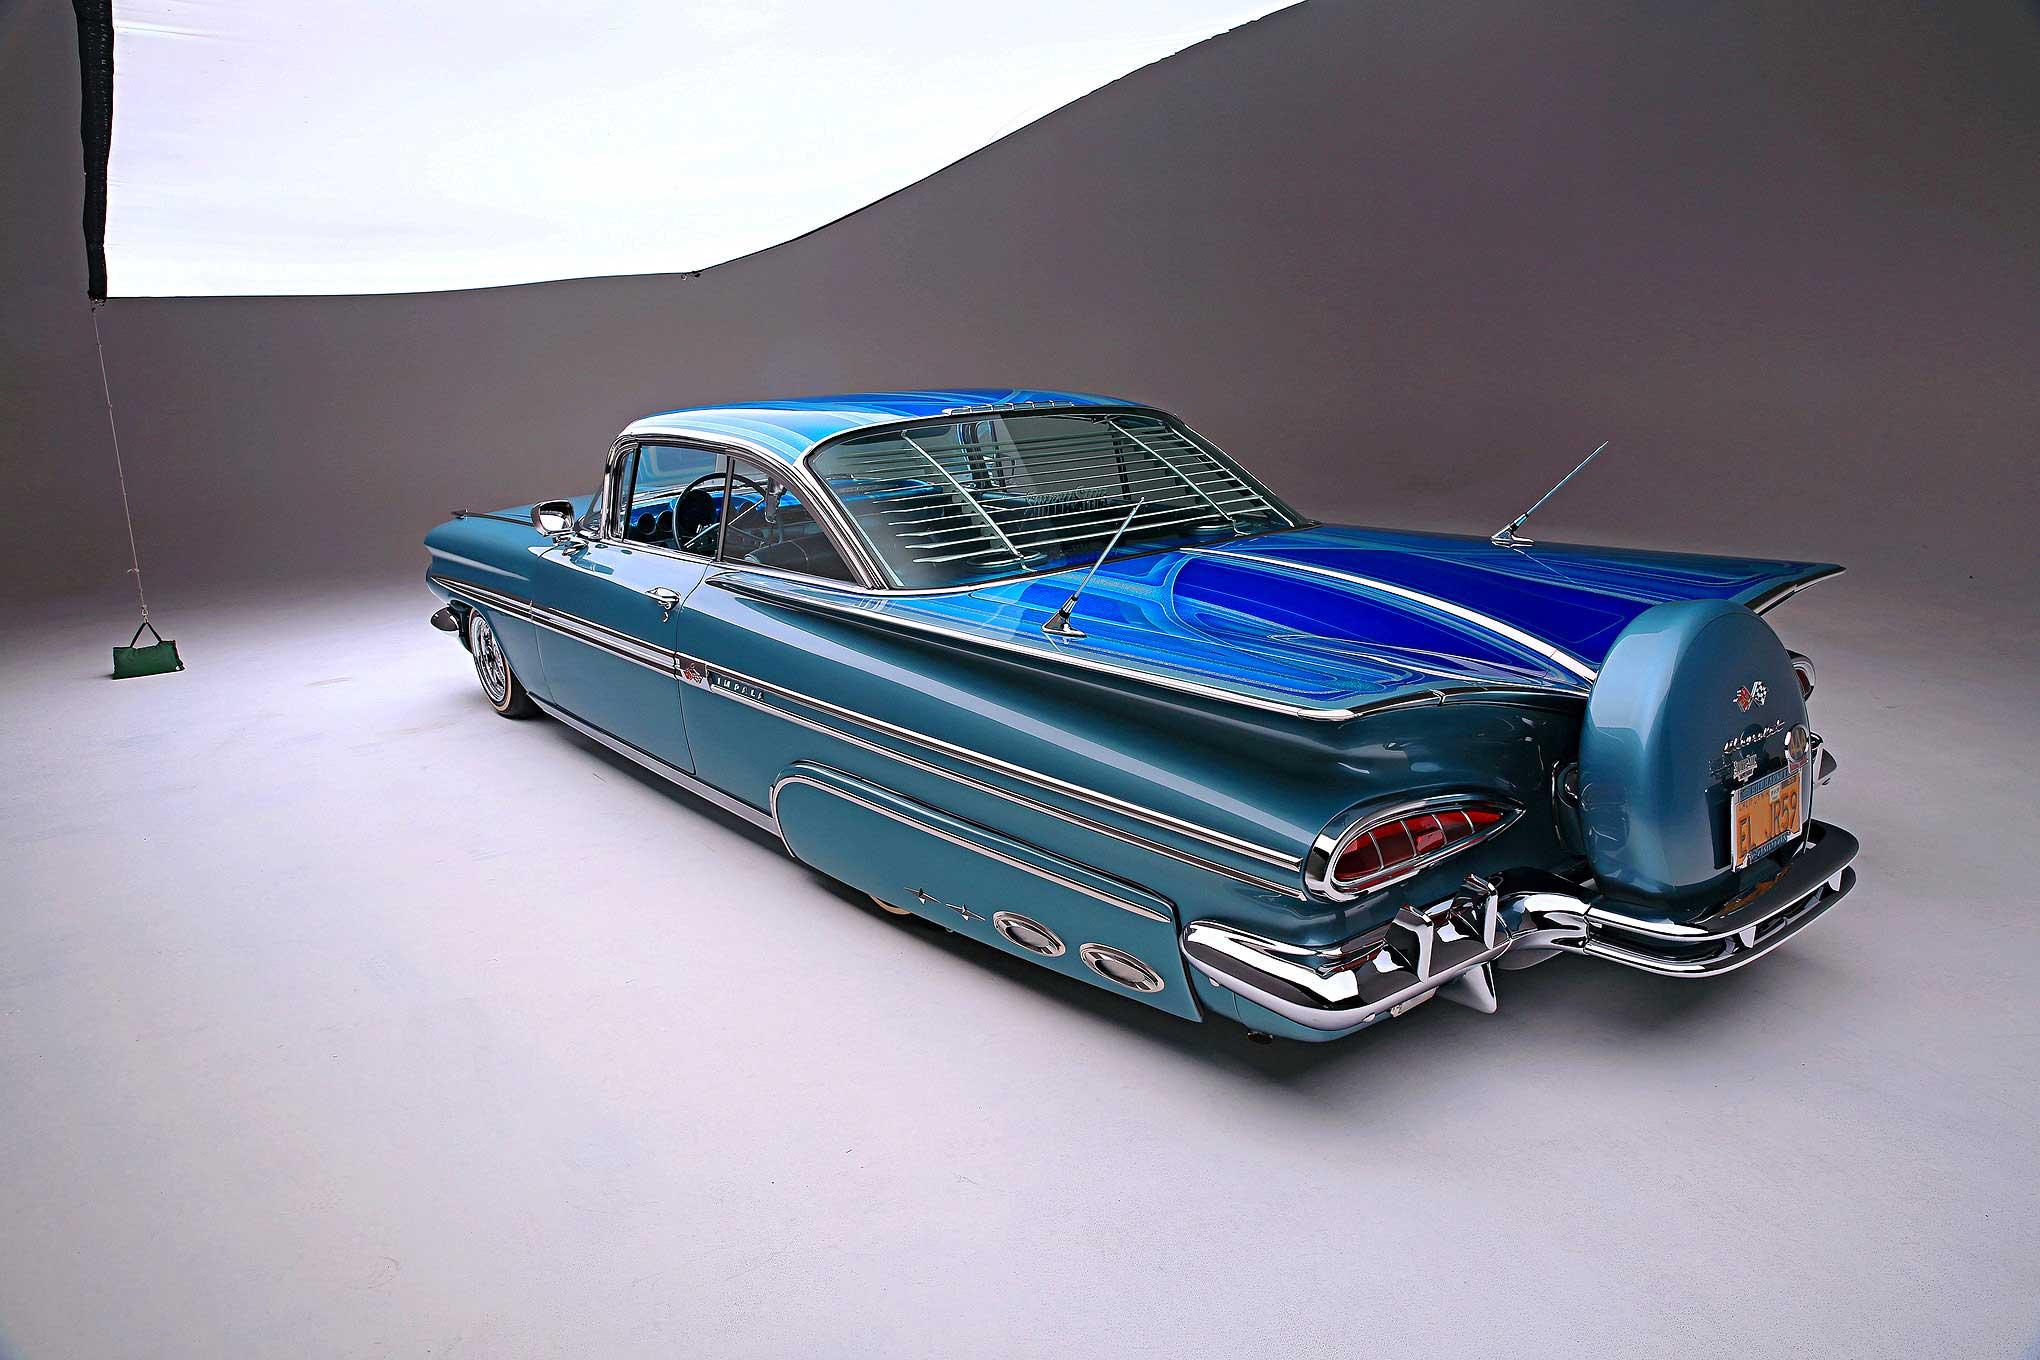 1959 Chevrolet Impala Built In Tijuana Chevy Rear Wiring Harness 33 72